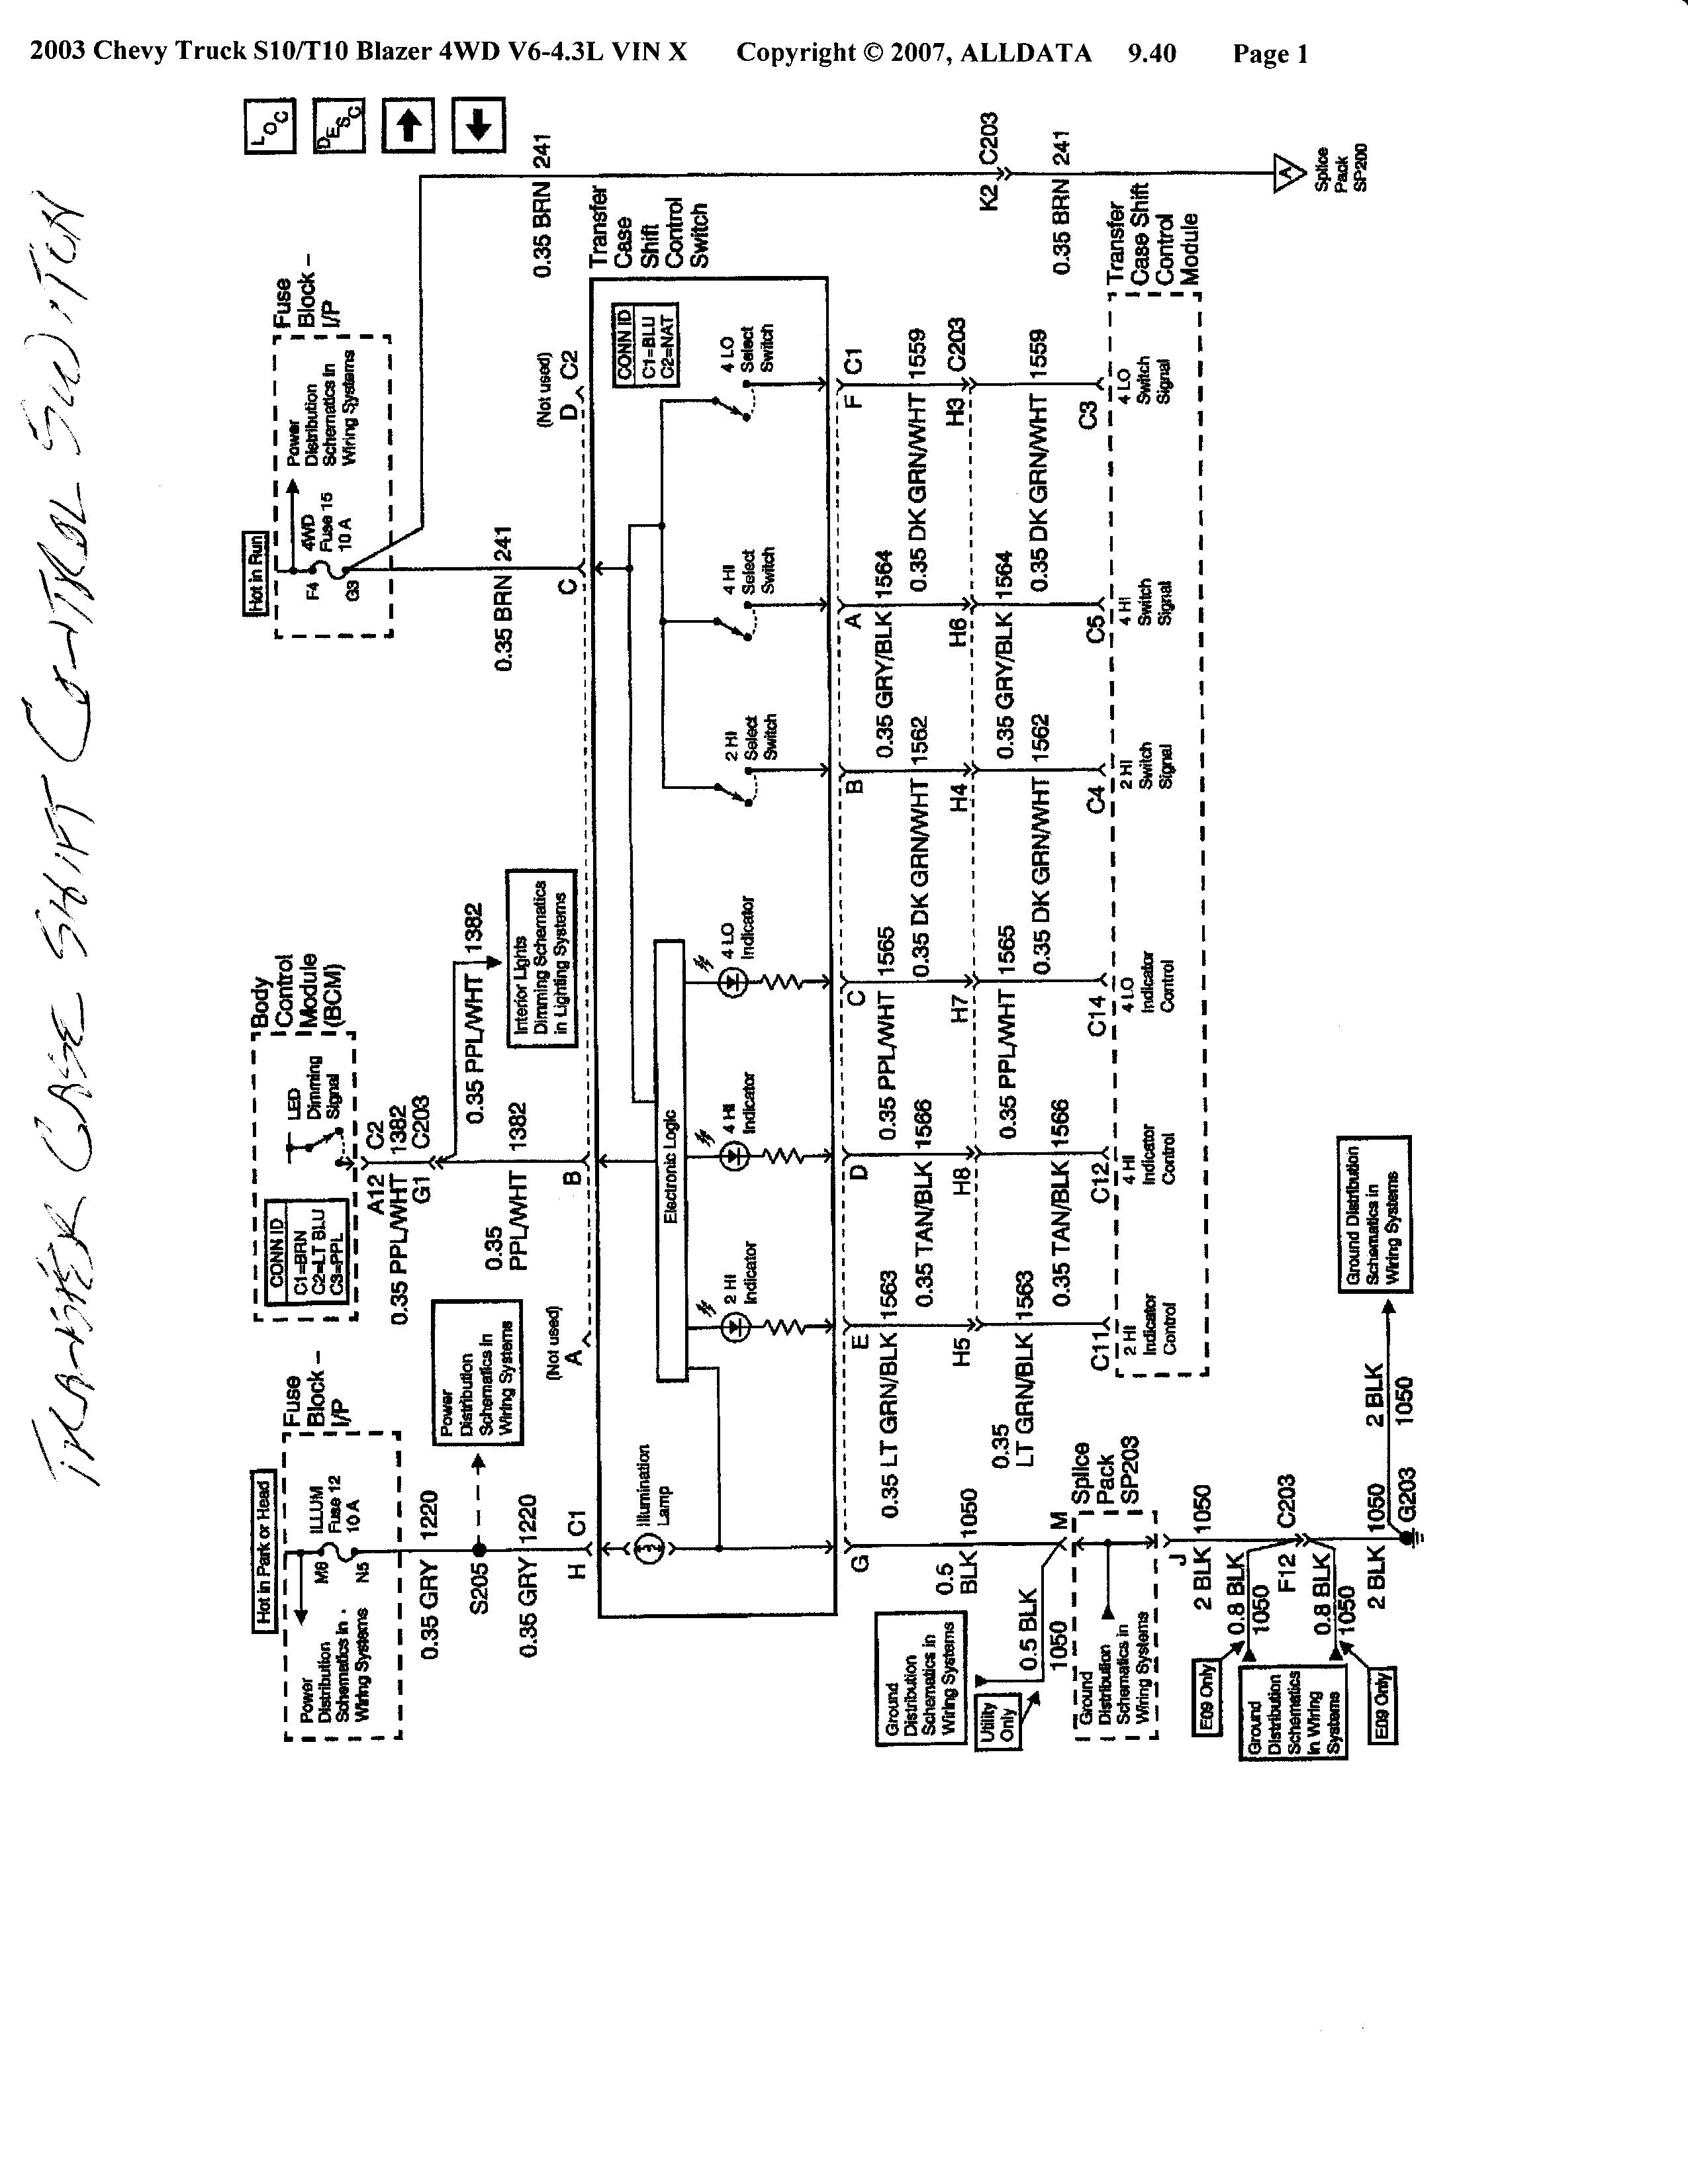 Diagram Wiring Diagram 2001 S10 Zr2 Full Version Hd Quality S10 Zr2 Blogwiring2f Atuttasosta It